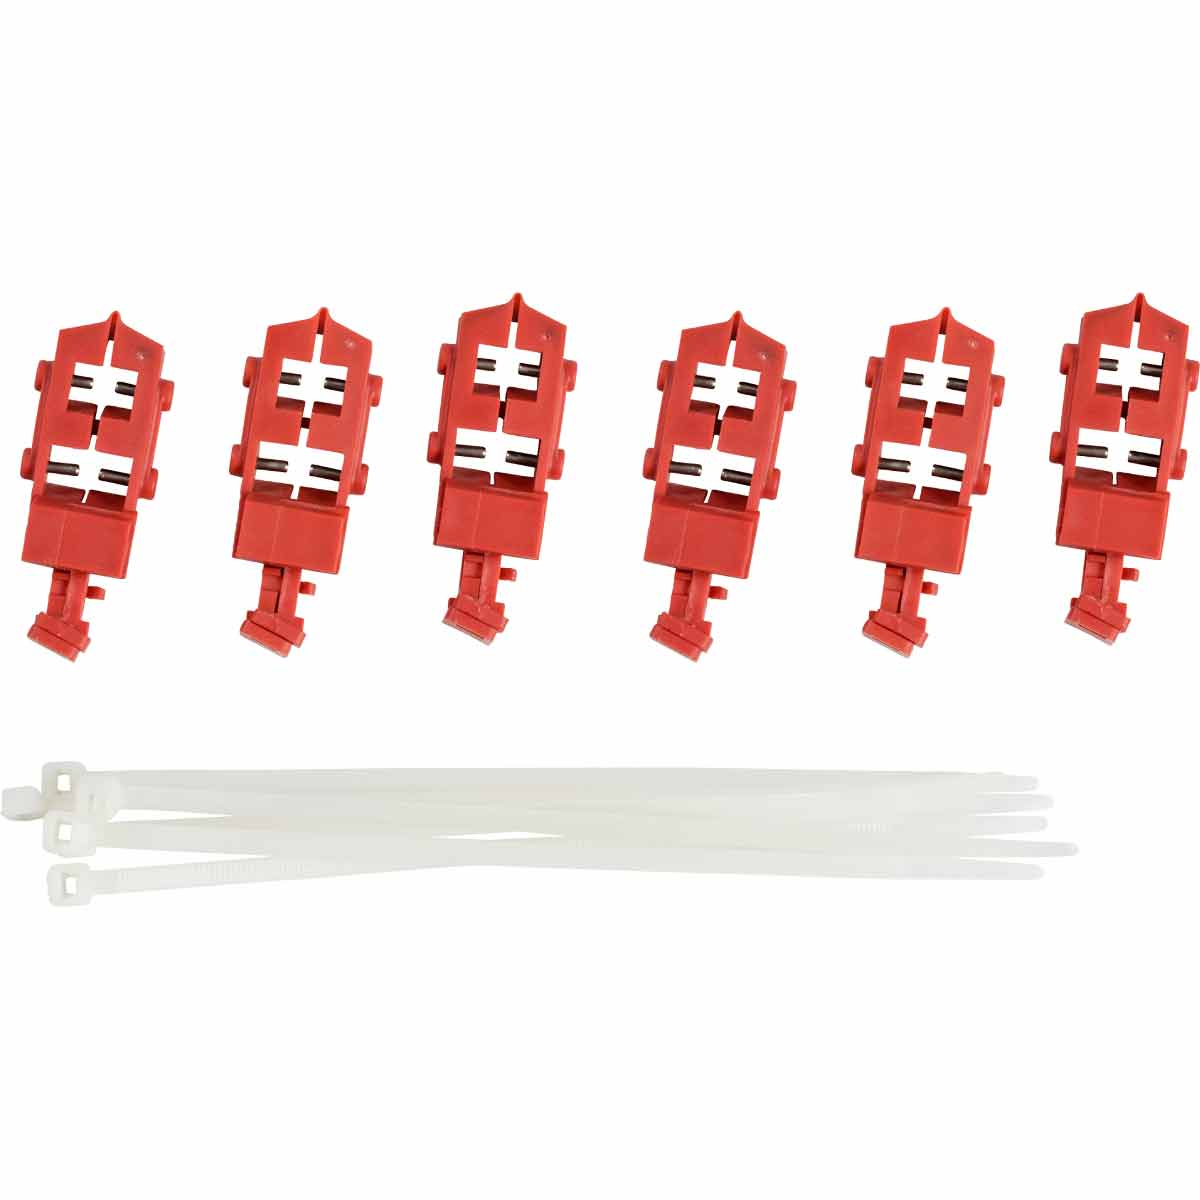 Brady 148694 Taglock Snap On Circuit Breaker Lo Blk50 Gordon Electric Supply Inc